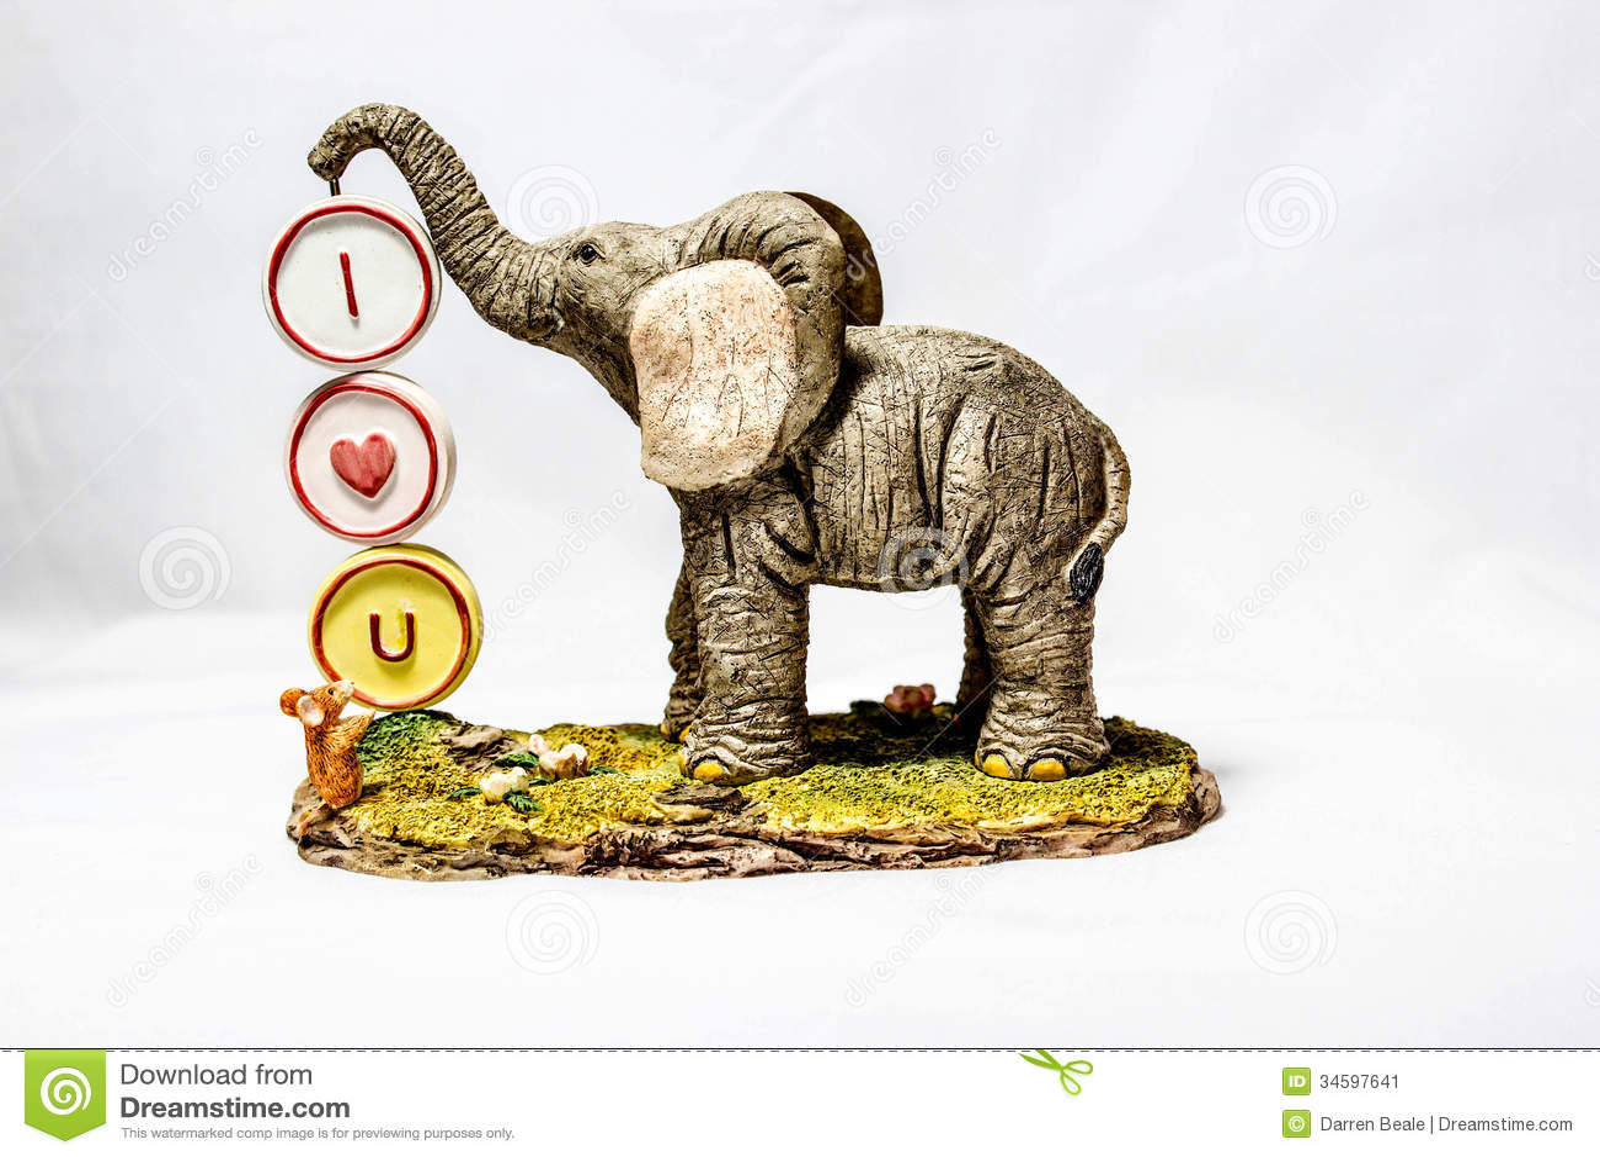 I Love You Imágenes De Stock I Love You Fotos De Stock: I Love You Elephant Stock Image